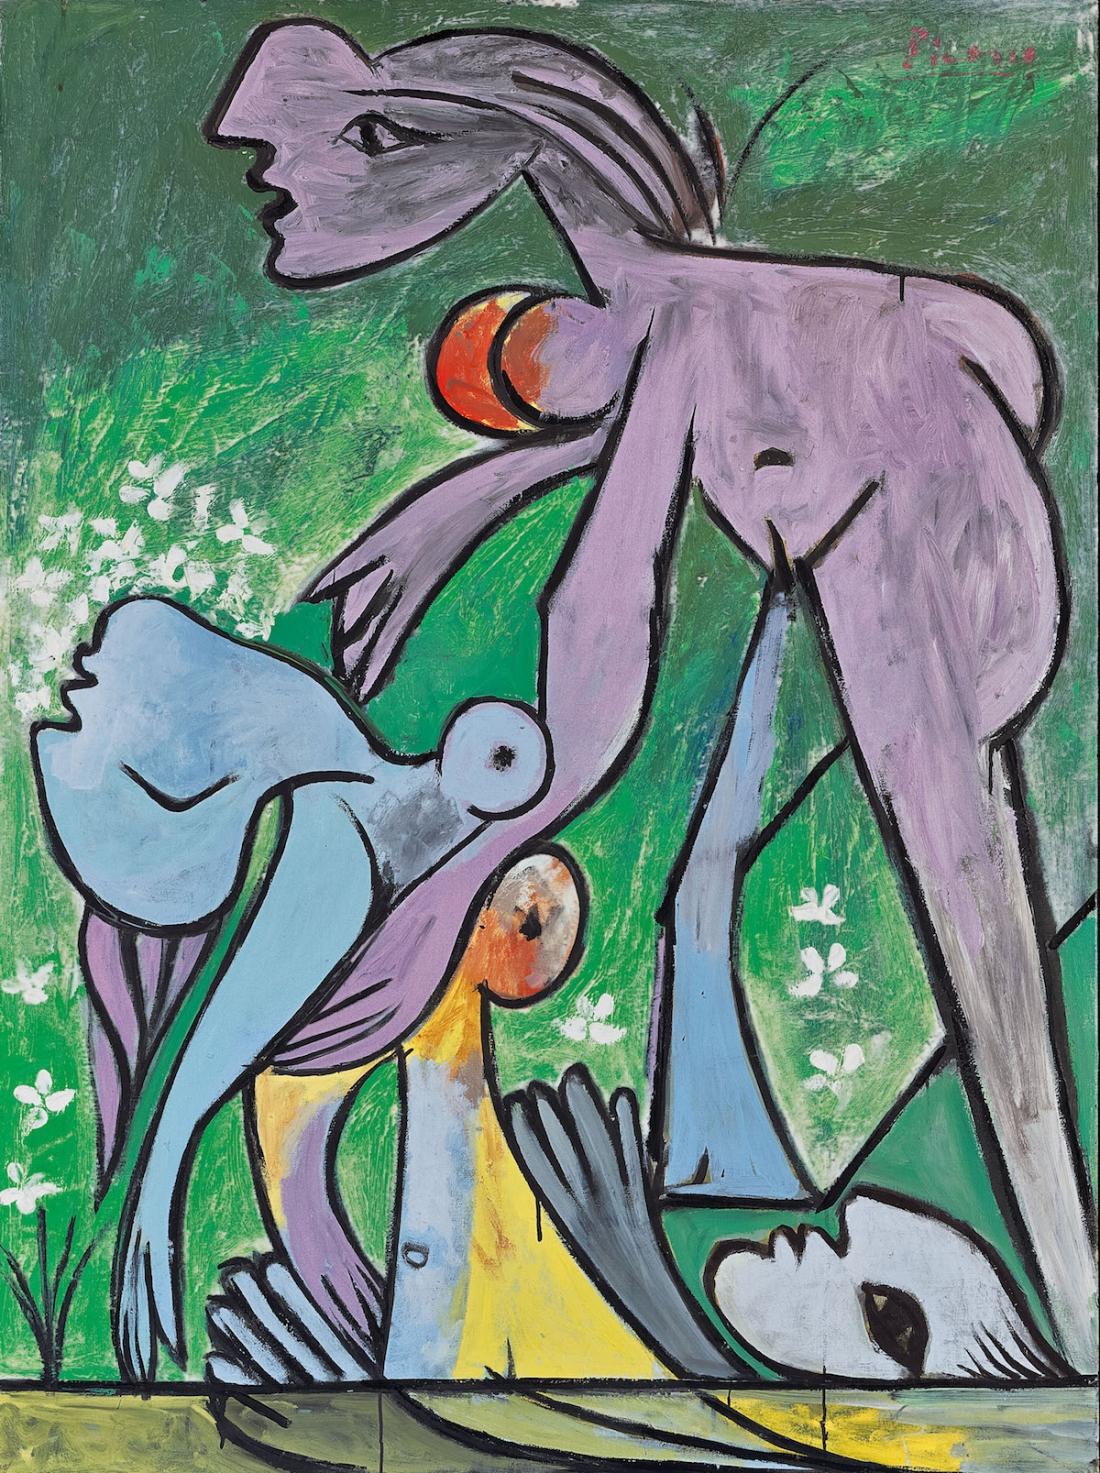 Pablo Picasso The Rescue (Le sauvetage)    1932 Oil paint on canvas 1445 x 1122 x 77 mm Fondation Beyeler, Riehen/ Basel, Sammlung Beyeler © Succession Picasso/ DACS London, 2017